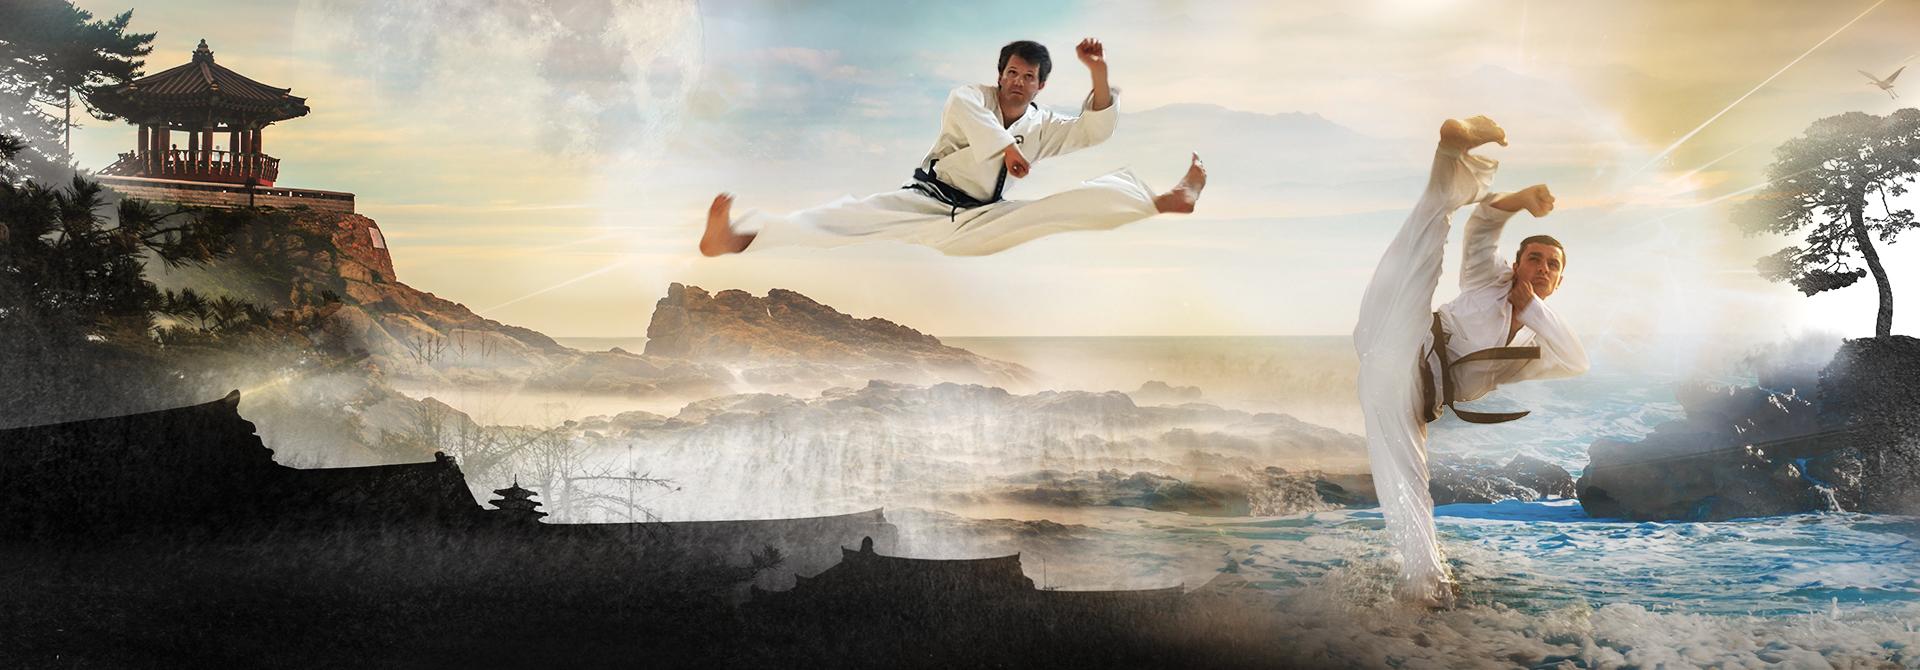 WinTaekwondo Leitung